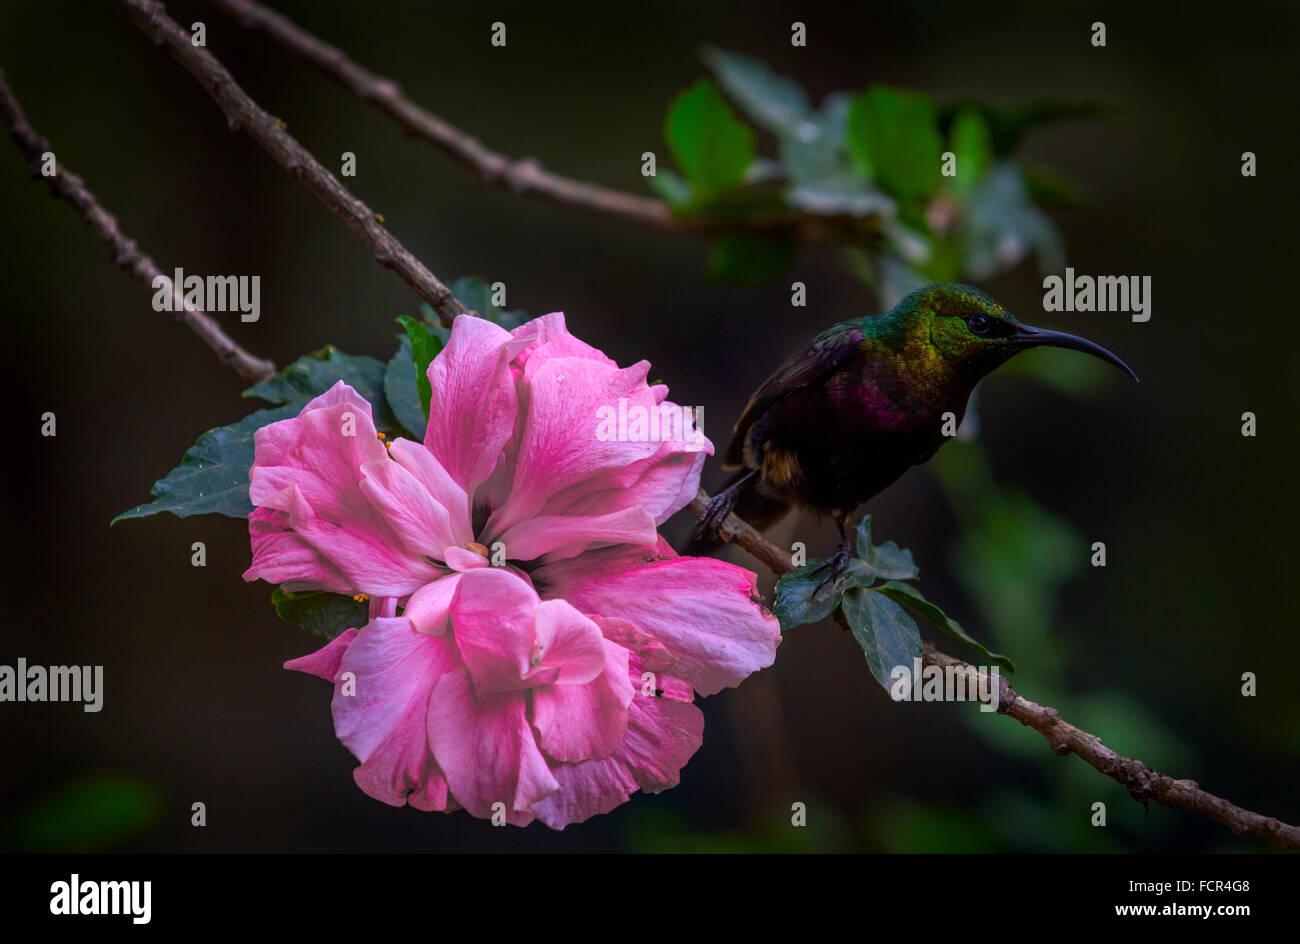 A humming bird sitting next to a pinkish flower, Ethiopia. - Stock Image